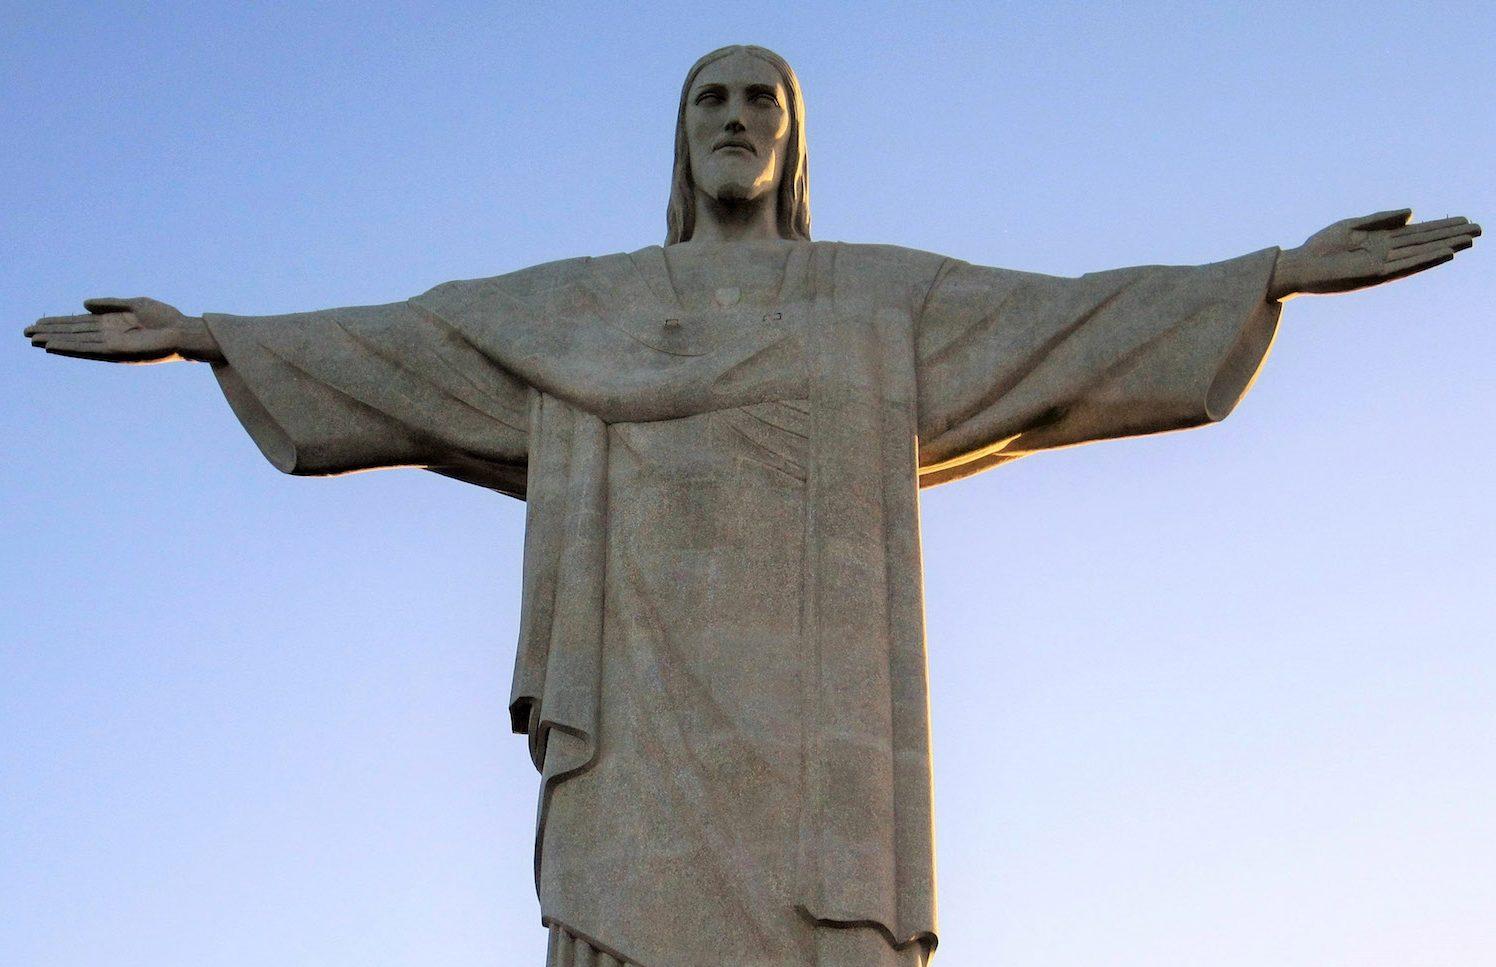 Christ the Redeemer Statute in Rio